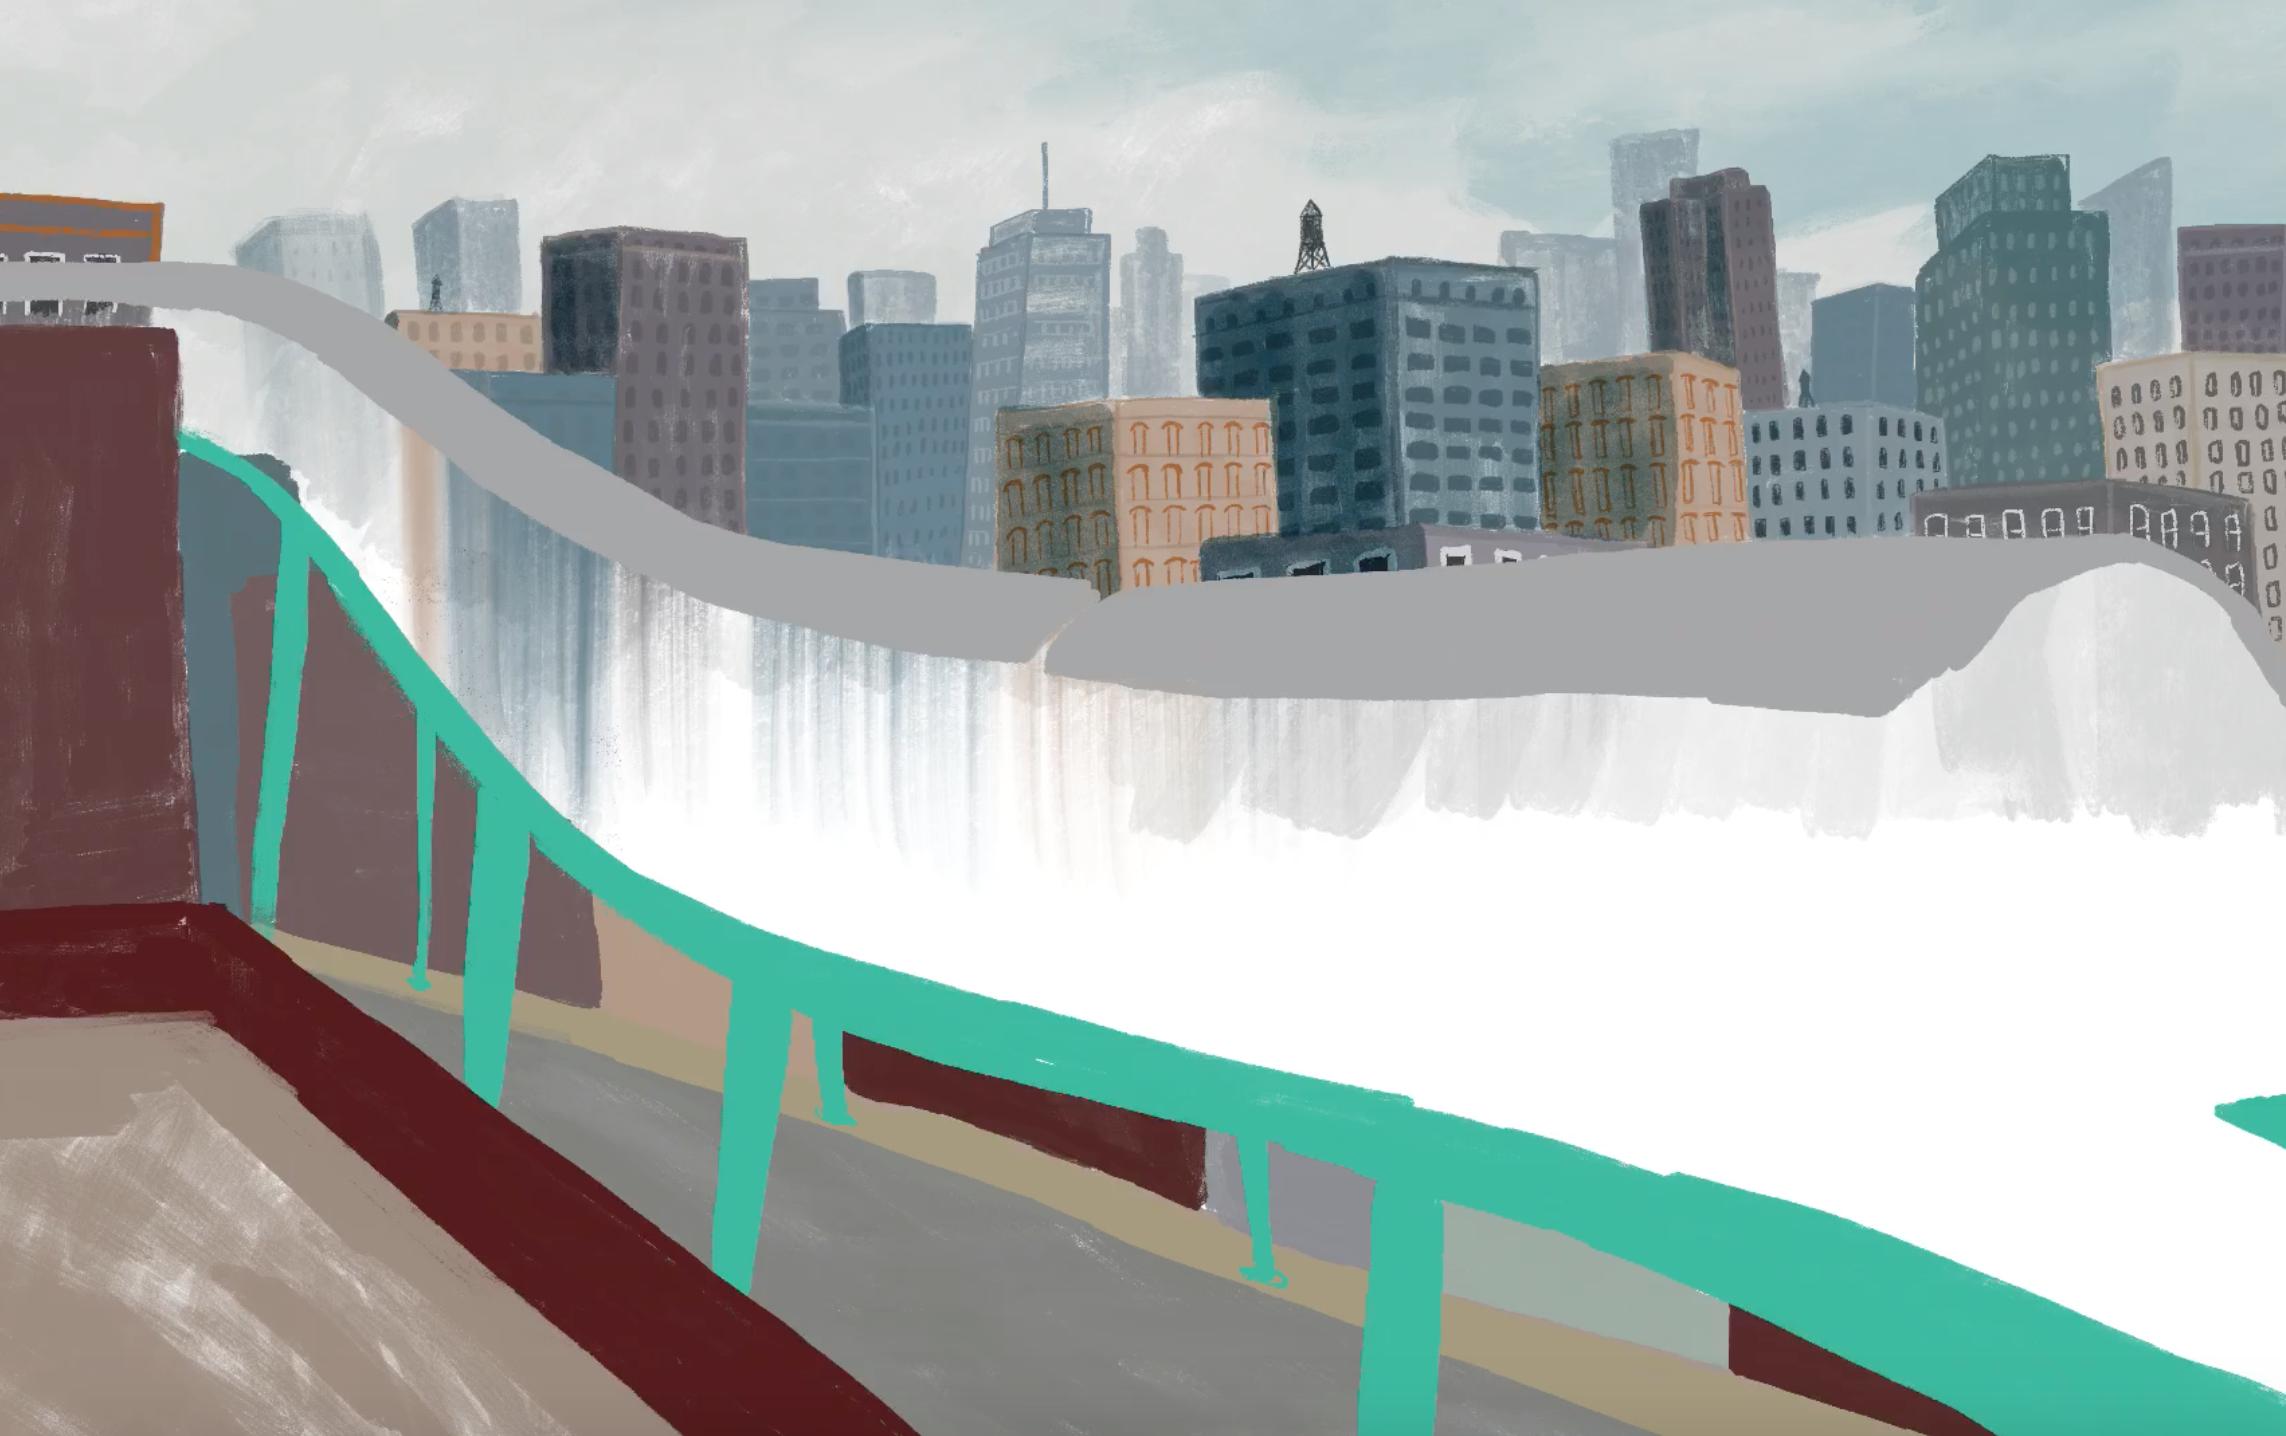 train illustration design process